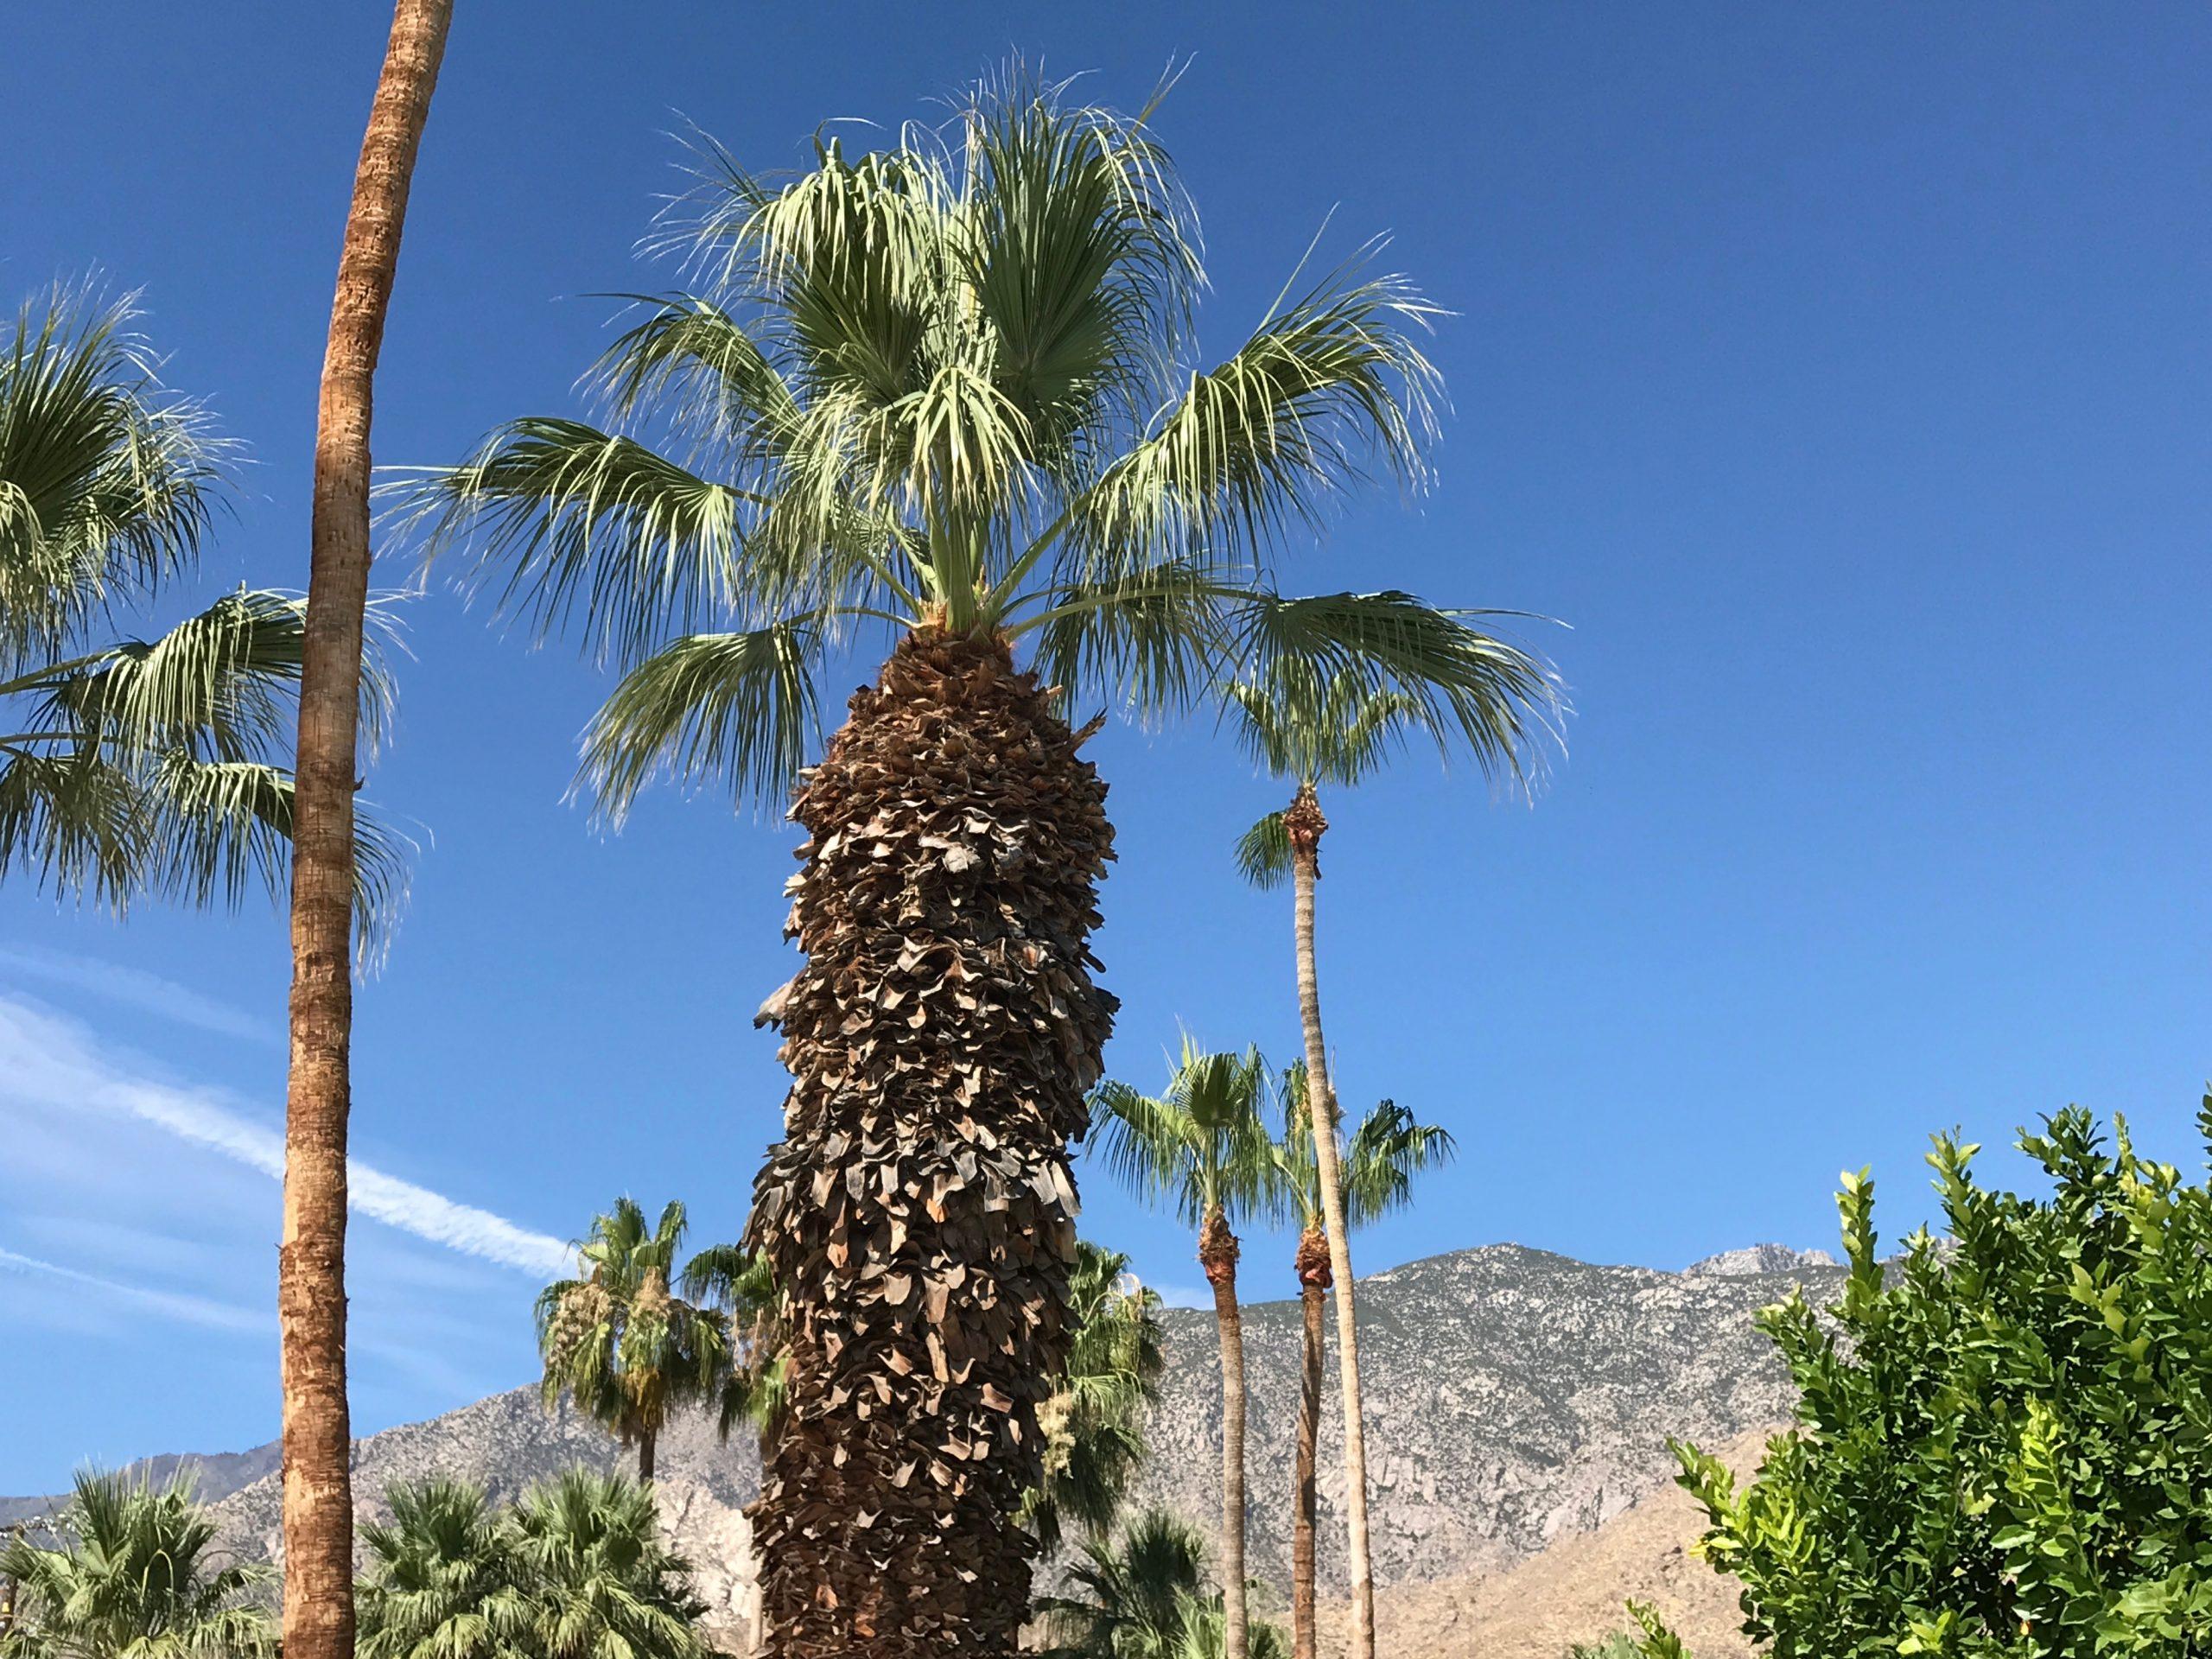 Mexican fan palms wave in the breeze near Palm Springs, CA